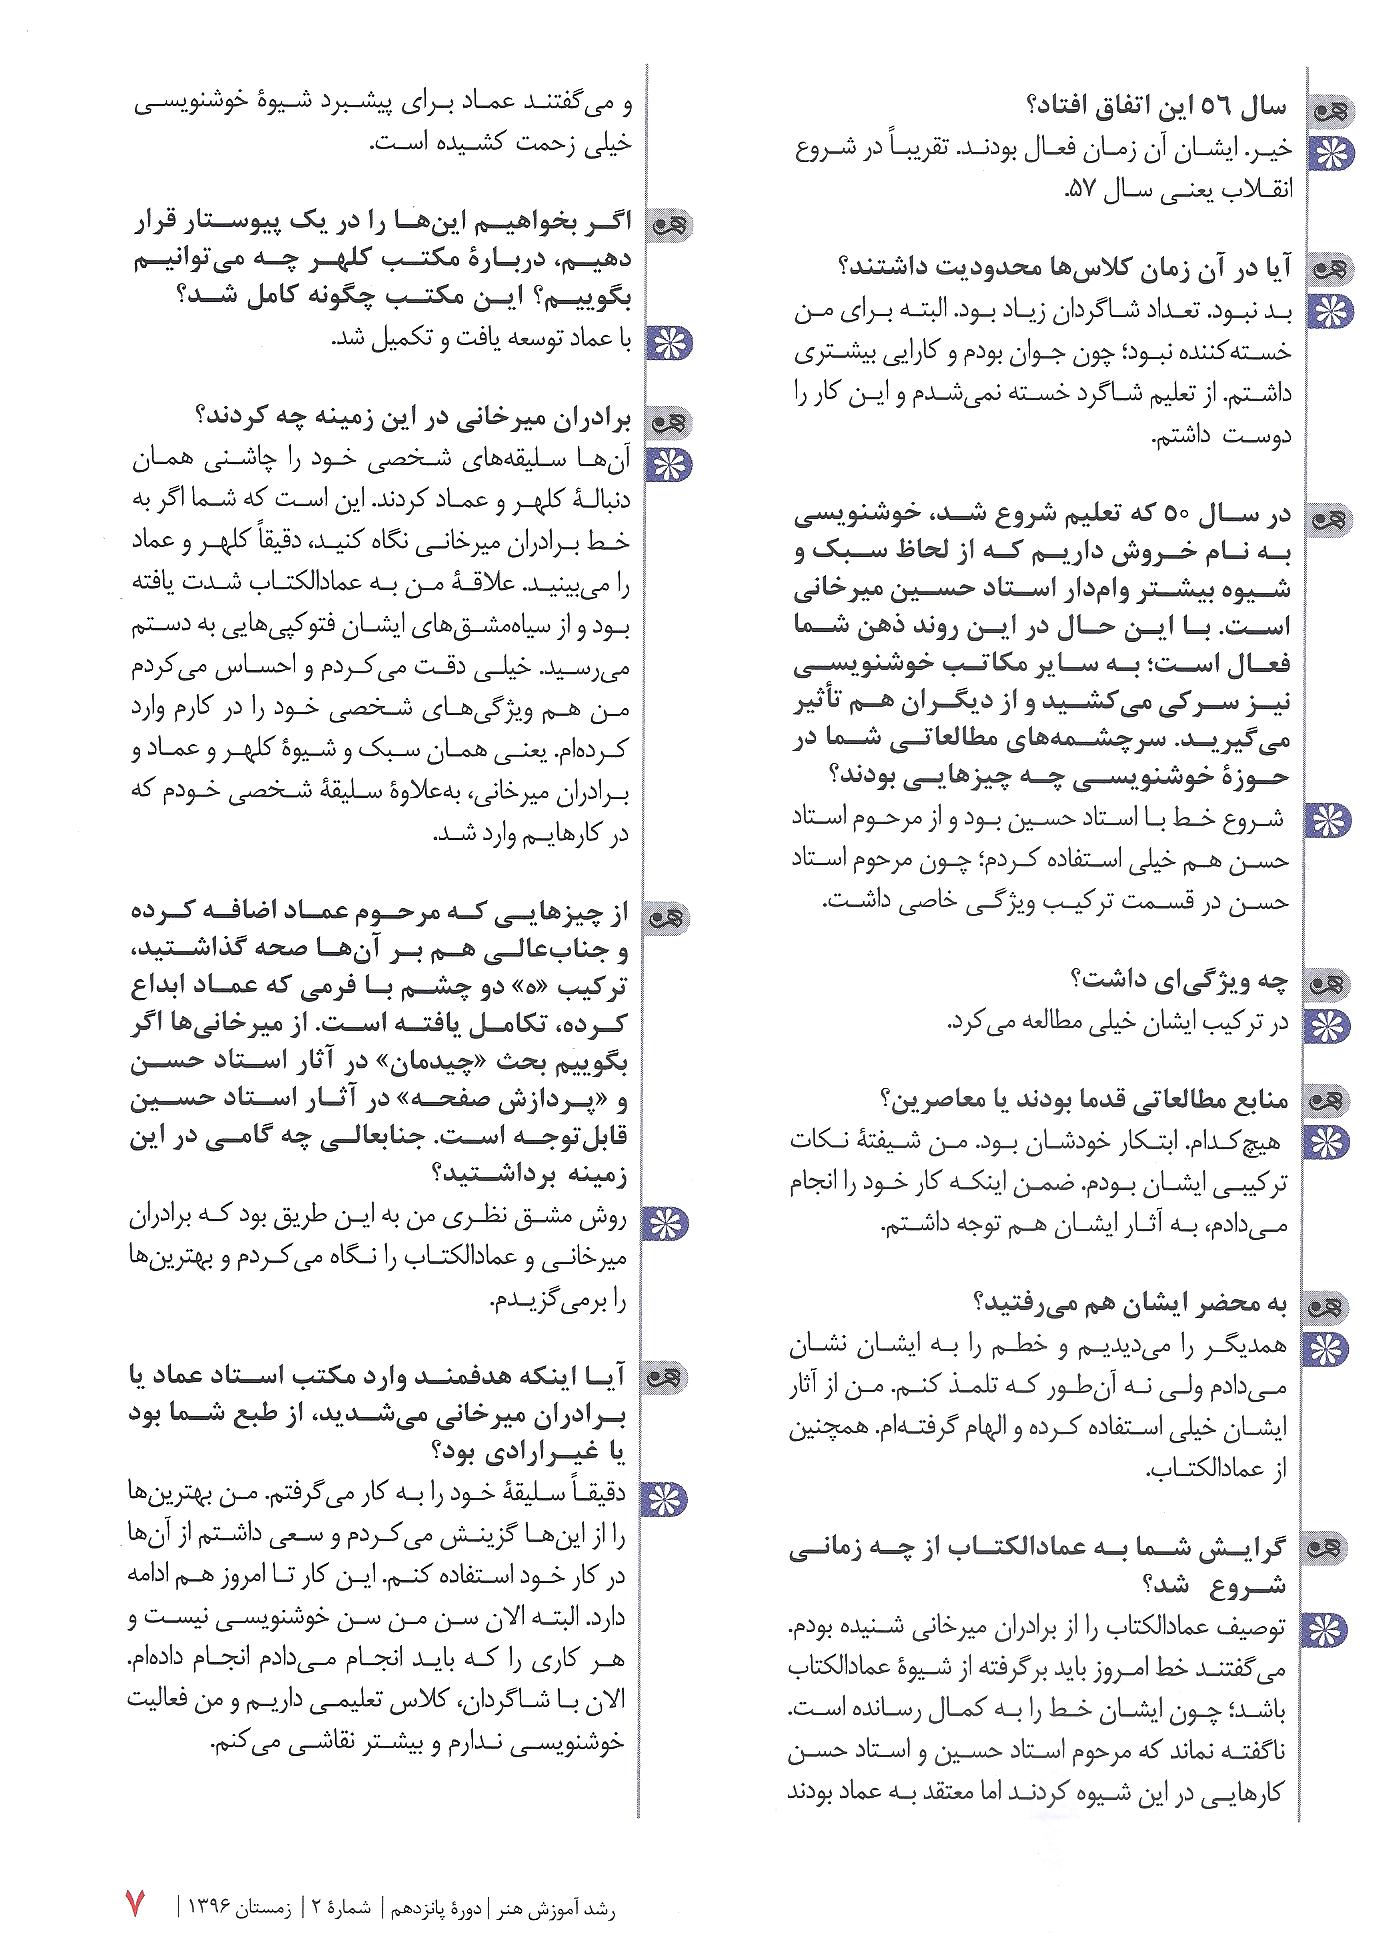 انجمن خوشنویسان تهران